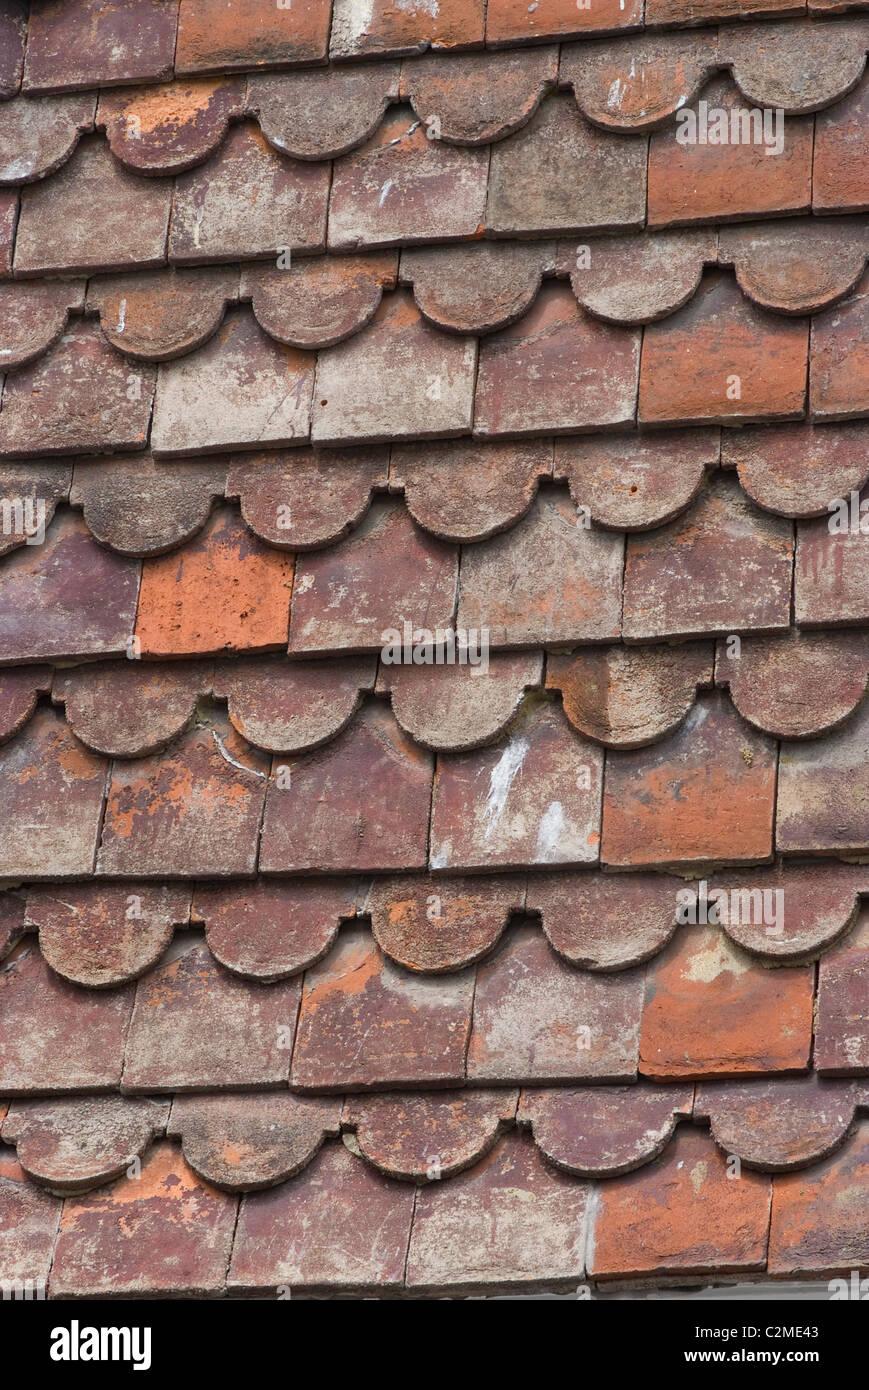 Tile detail, Rye, Kent, England - Stock Image